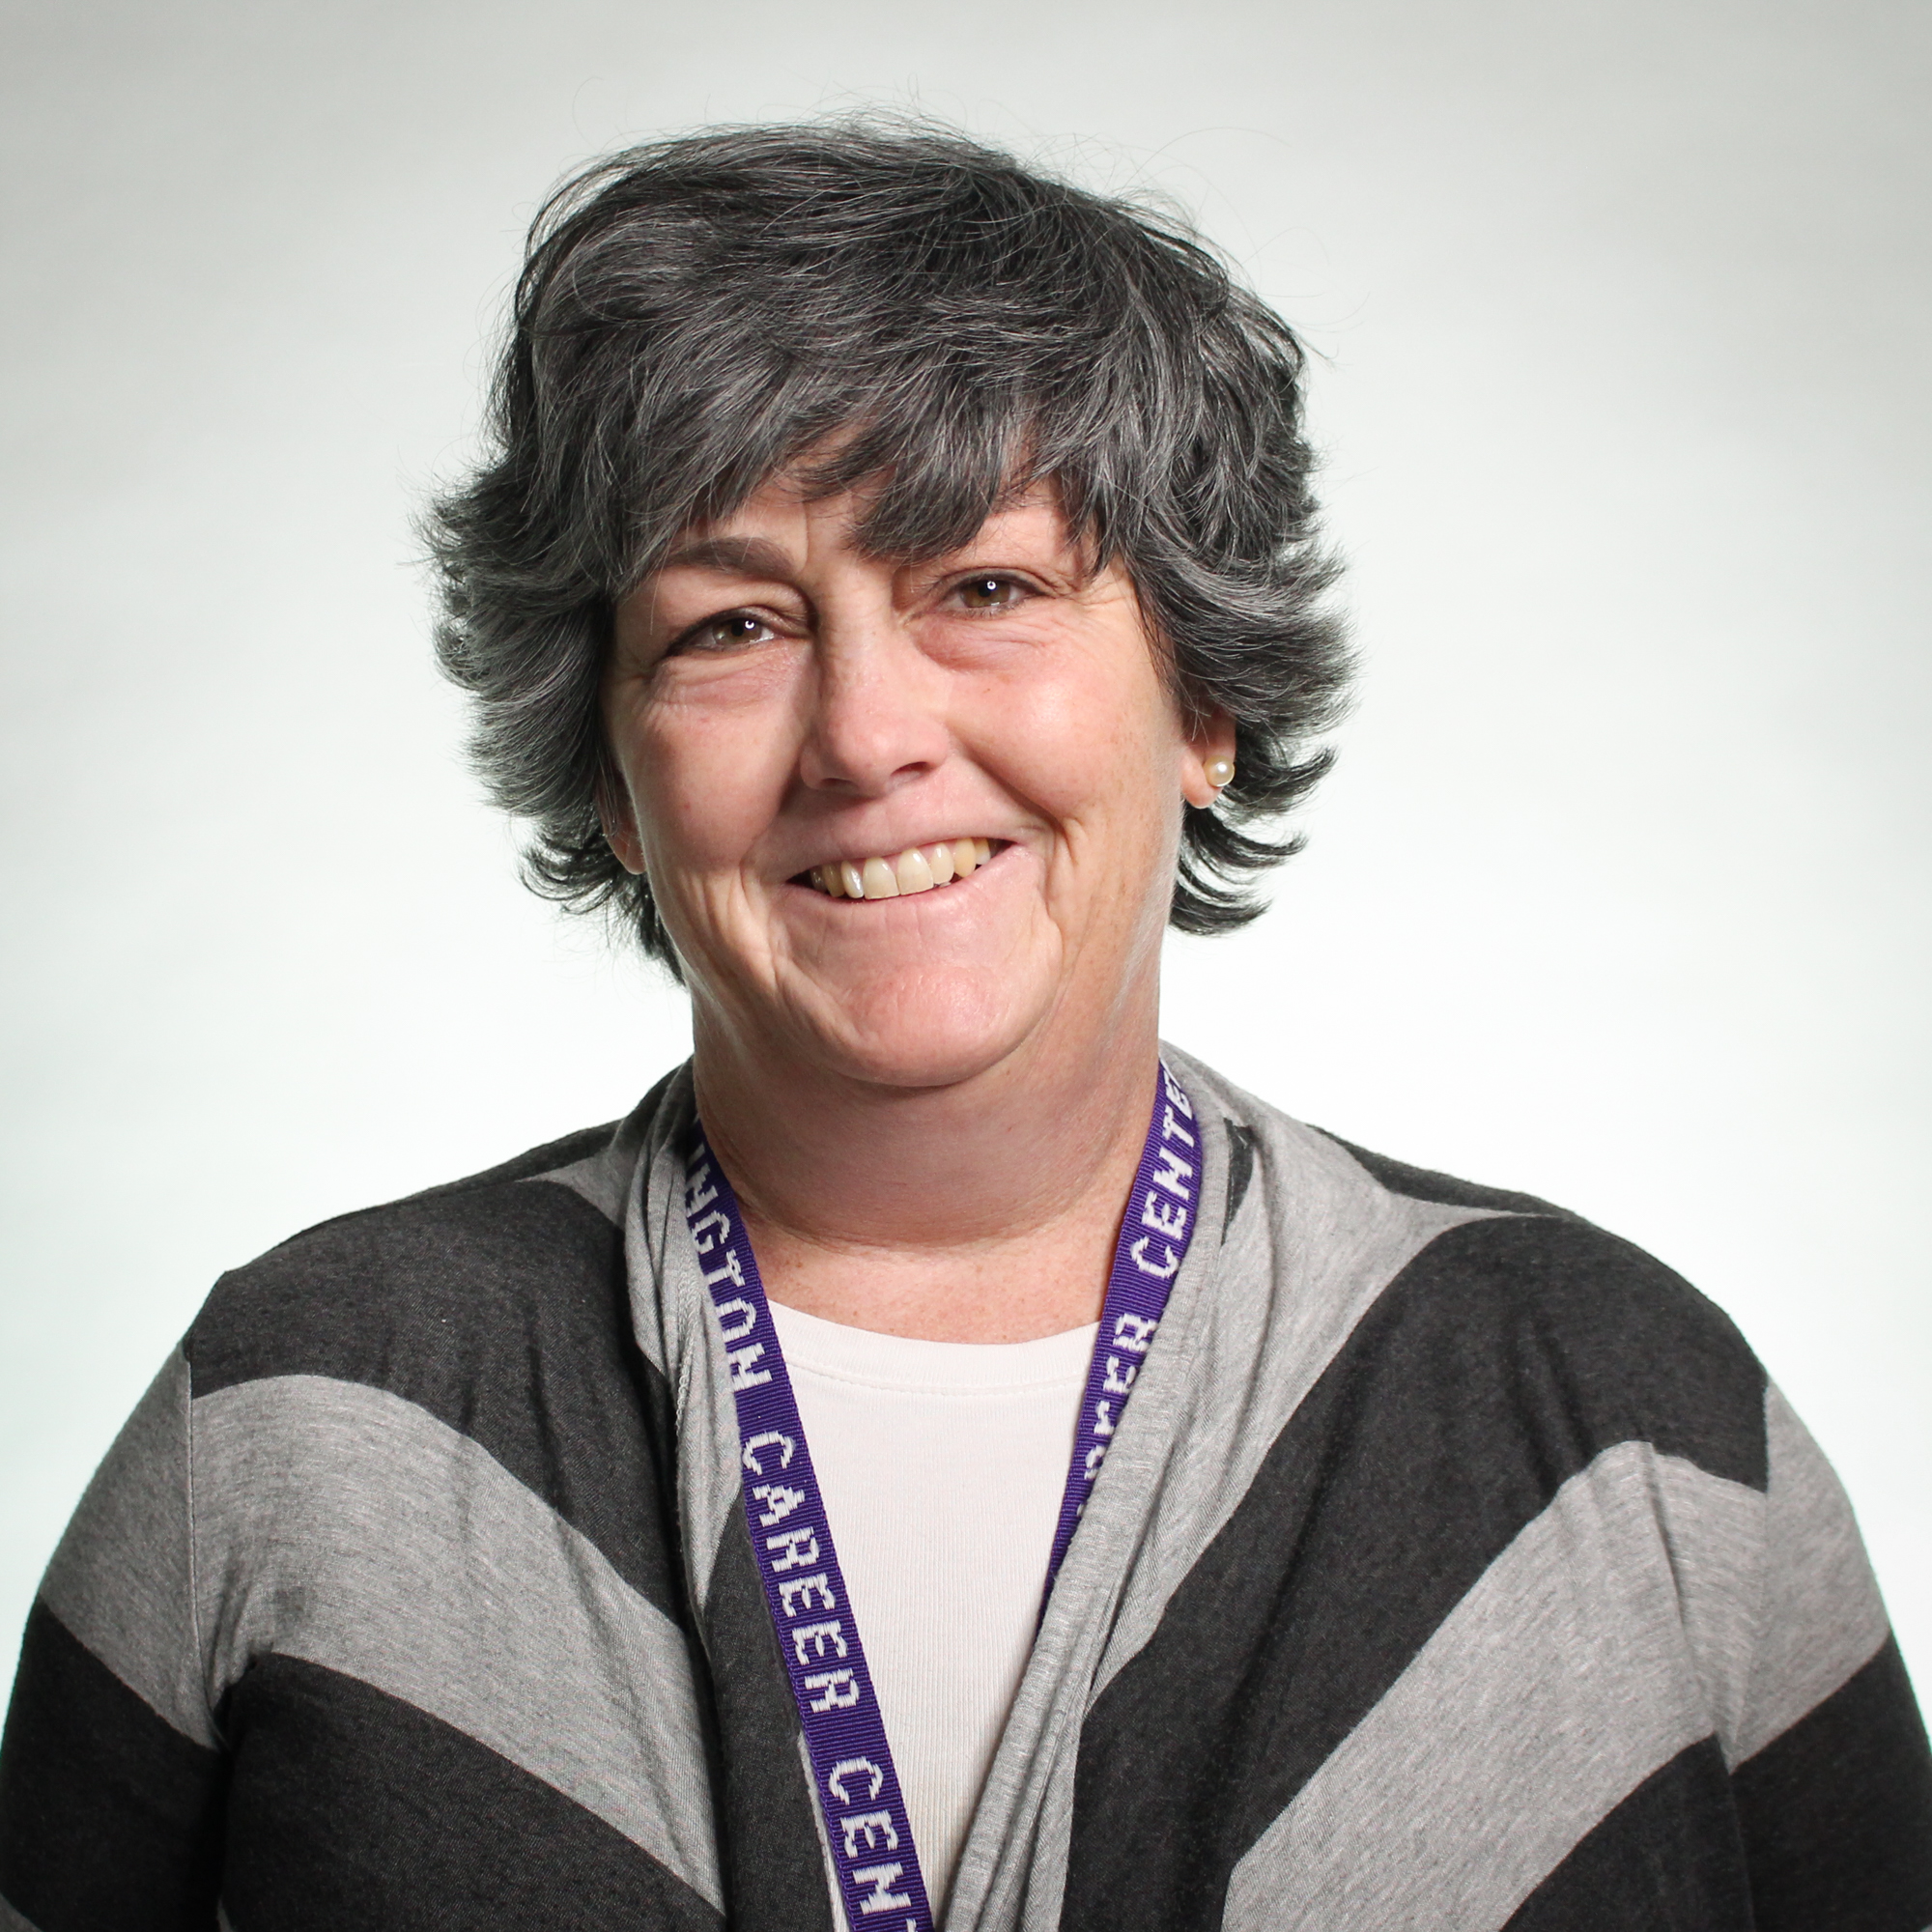 Ms. Erin Hannon